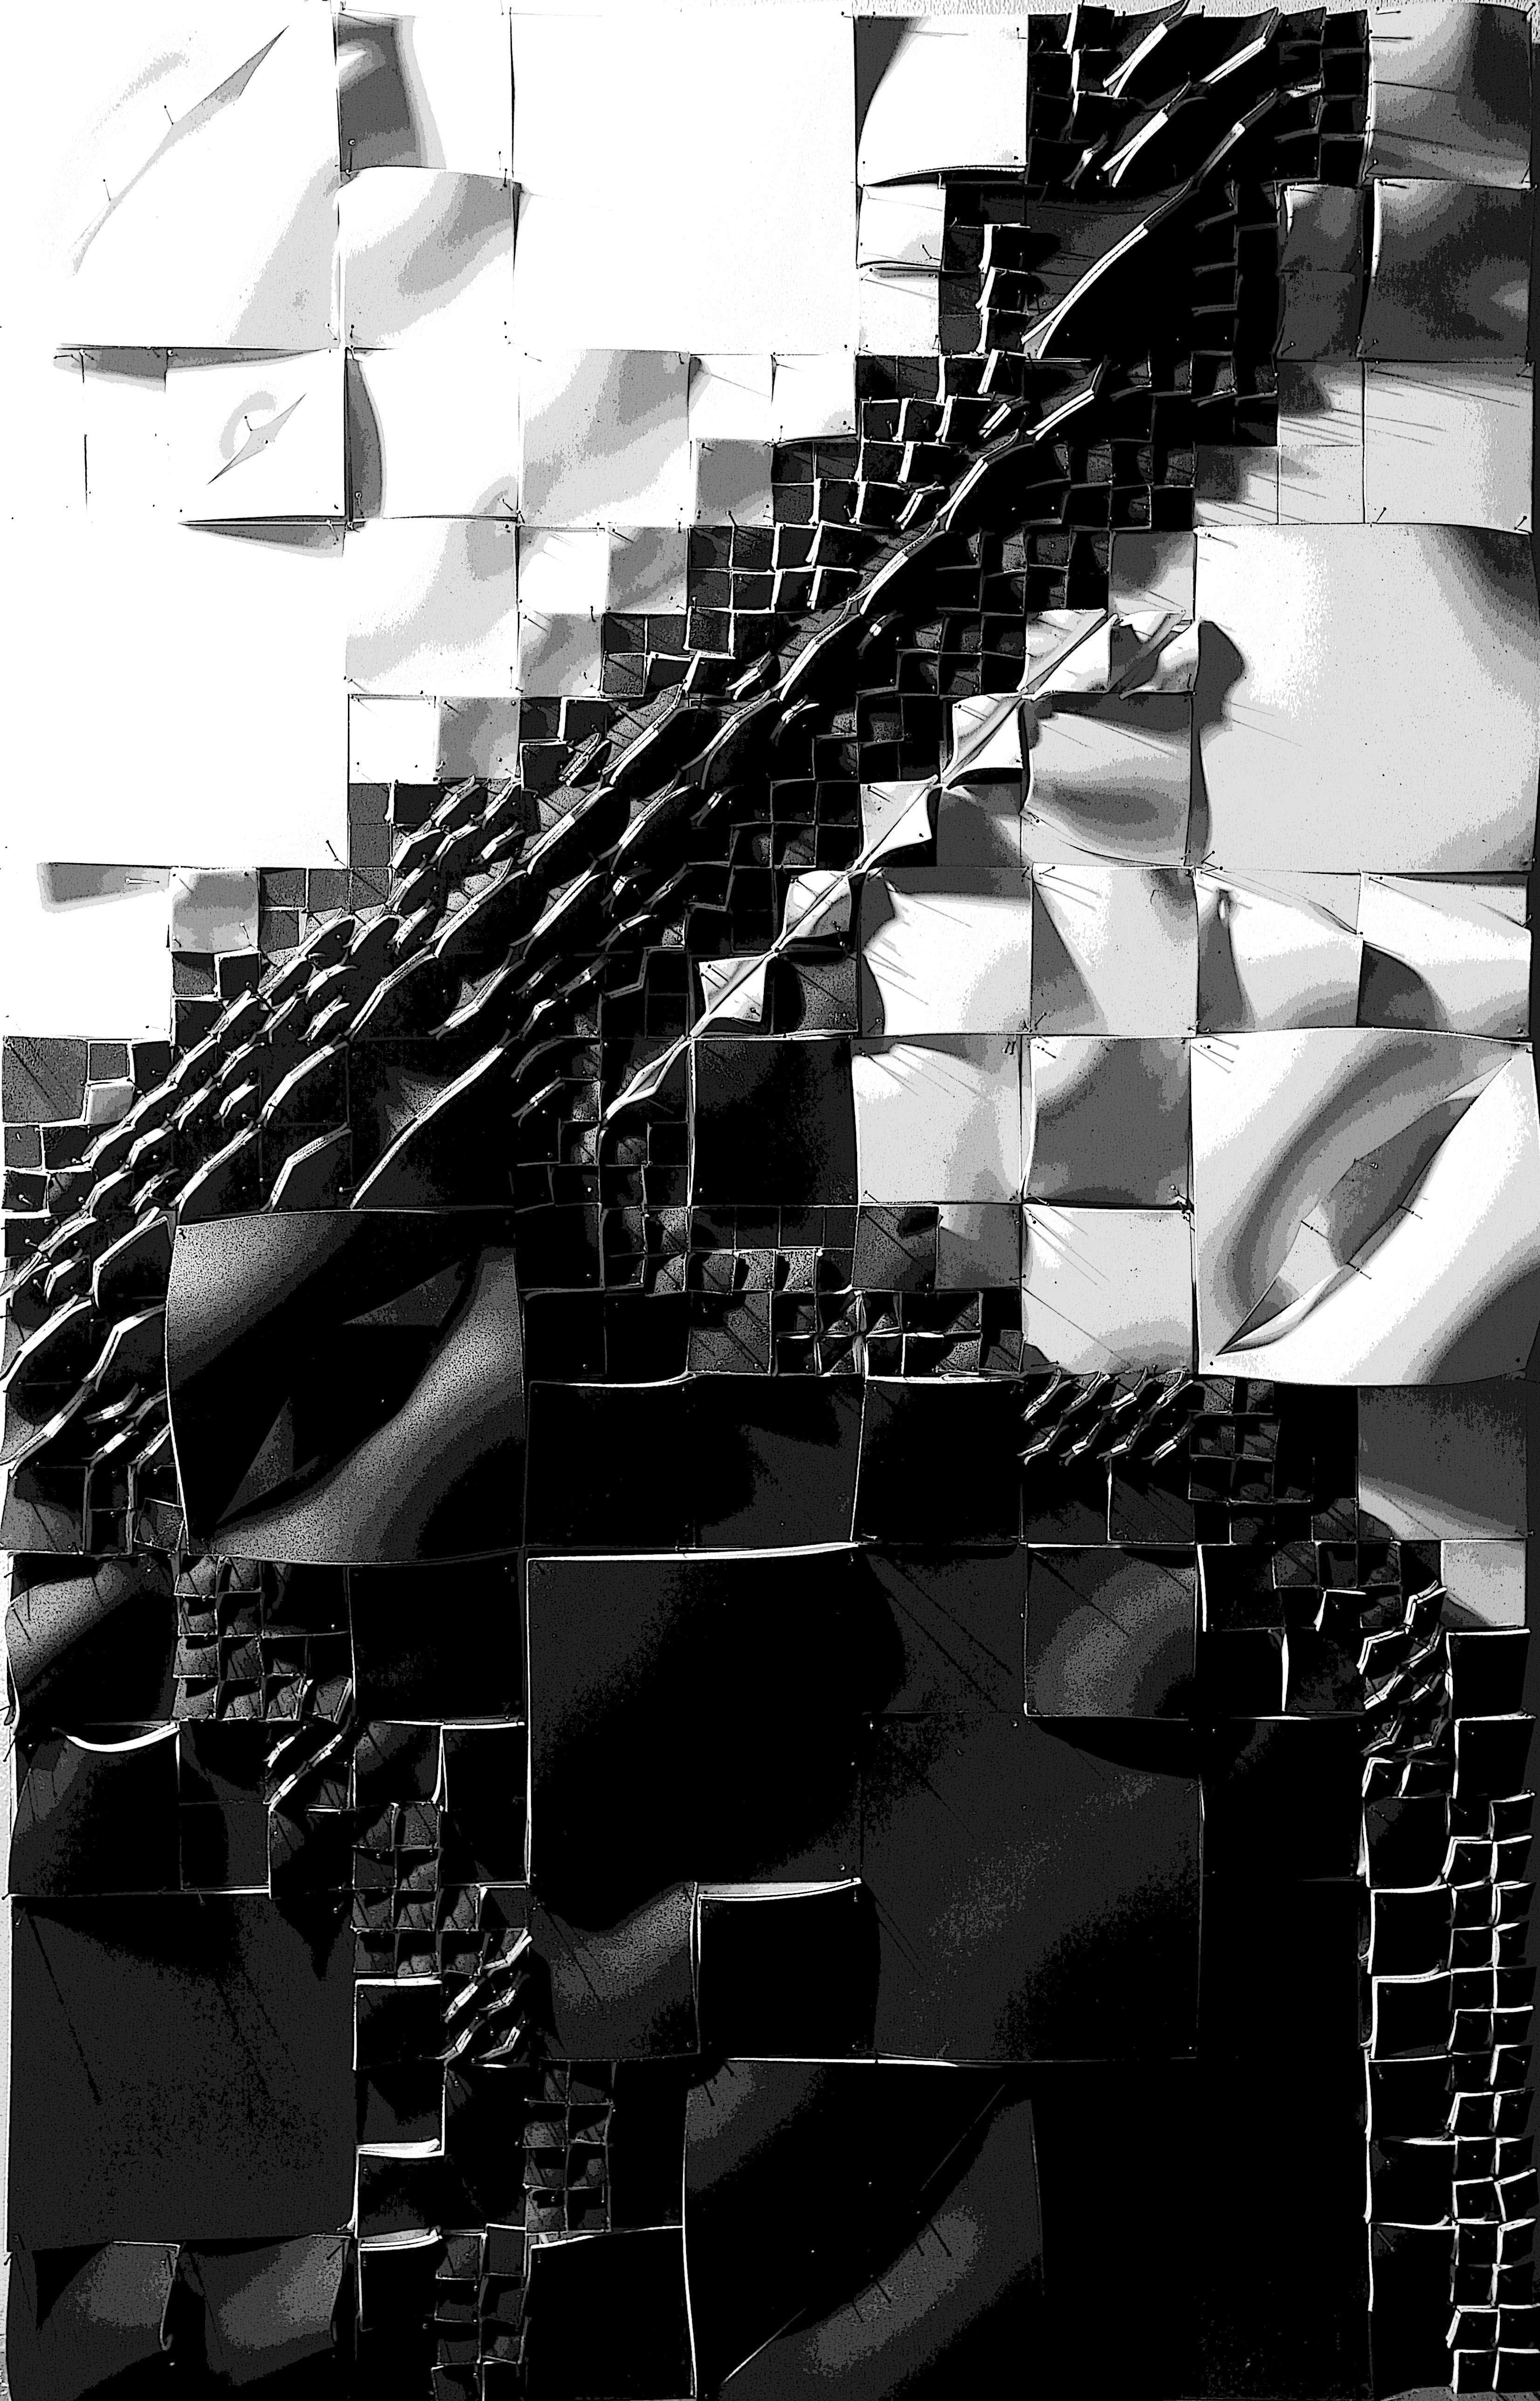 monir karimi | shell form finding system | zaha hadid studio